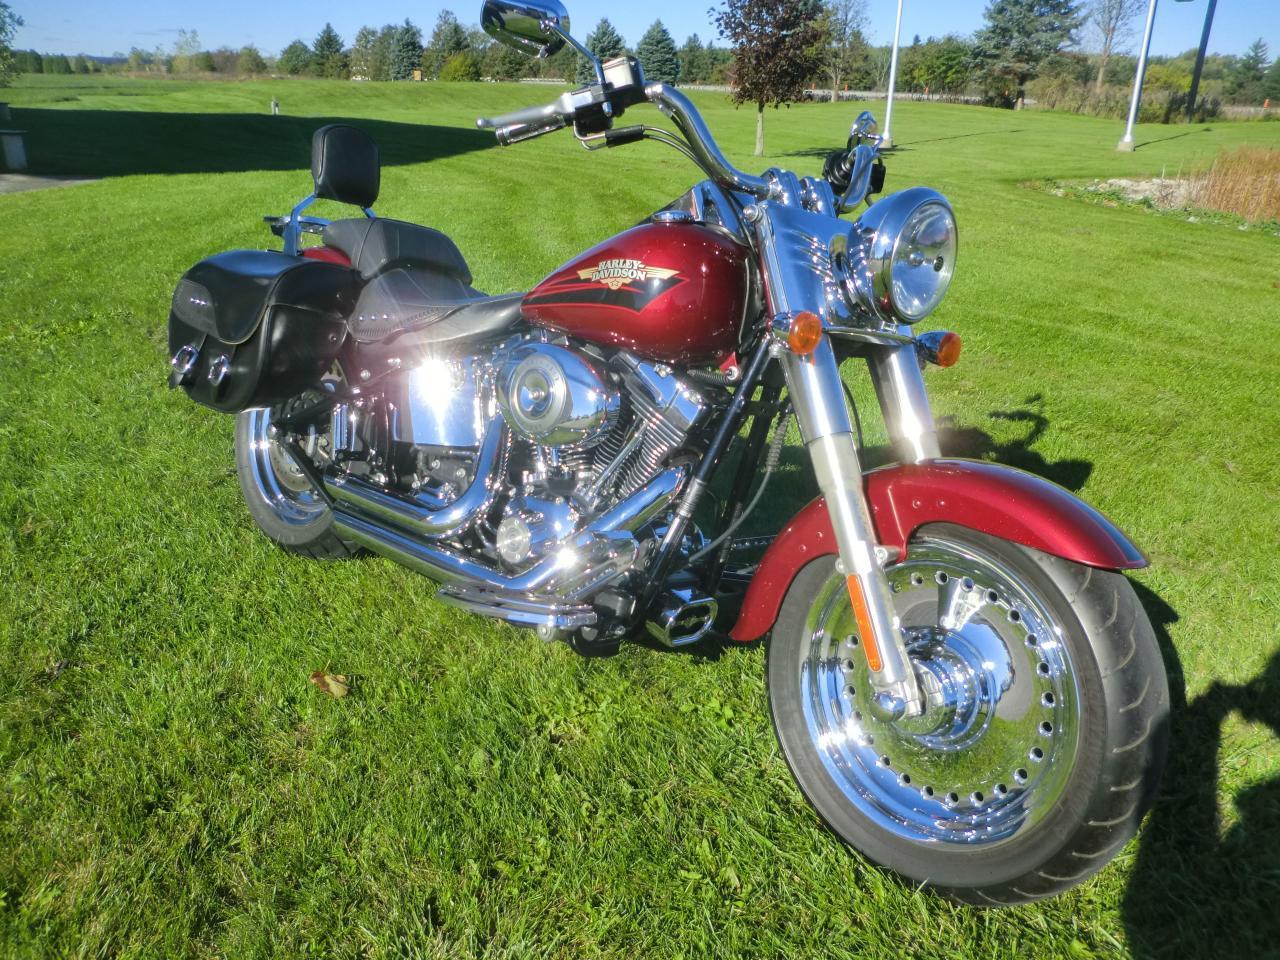 2009 Harley-Davidson FAT BOY FLSTI